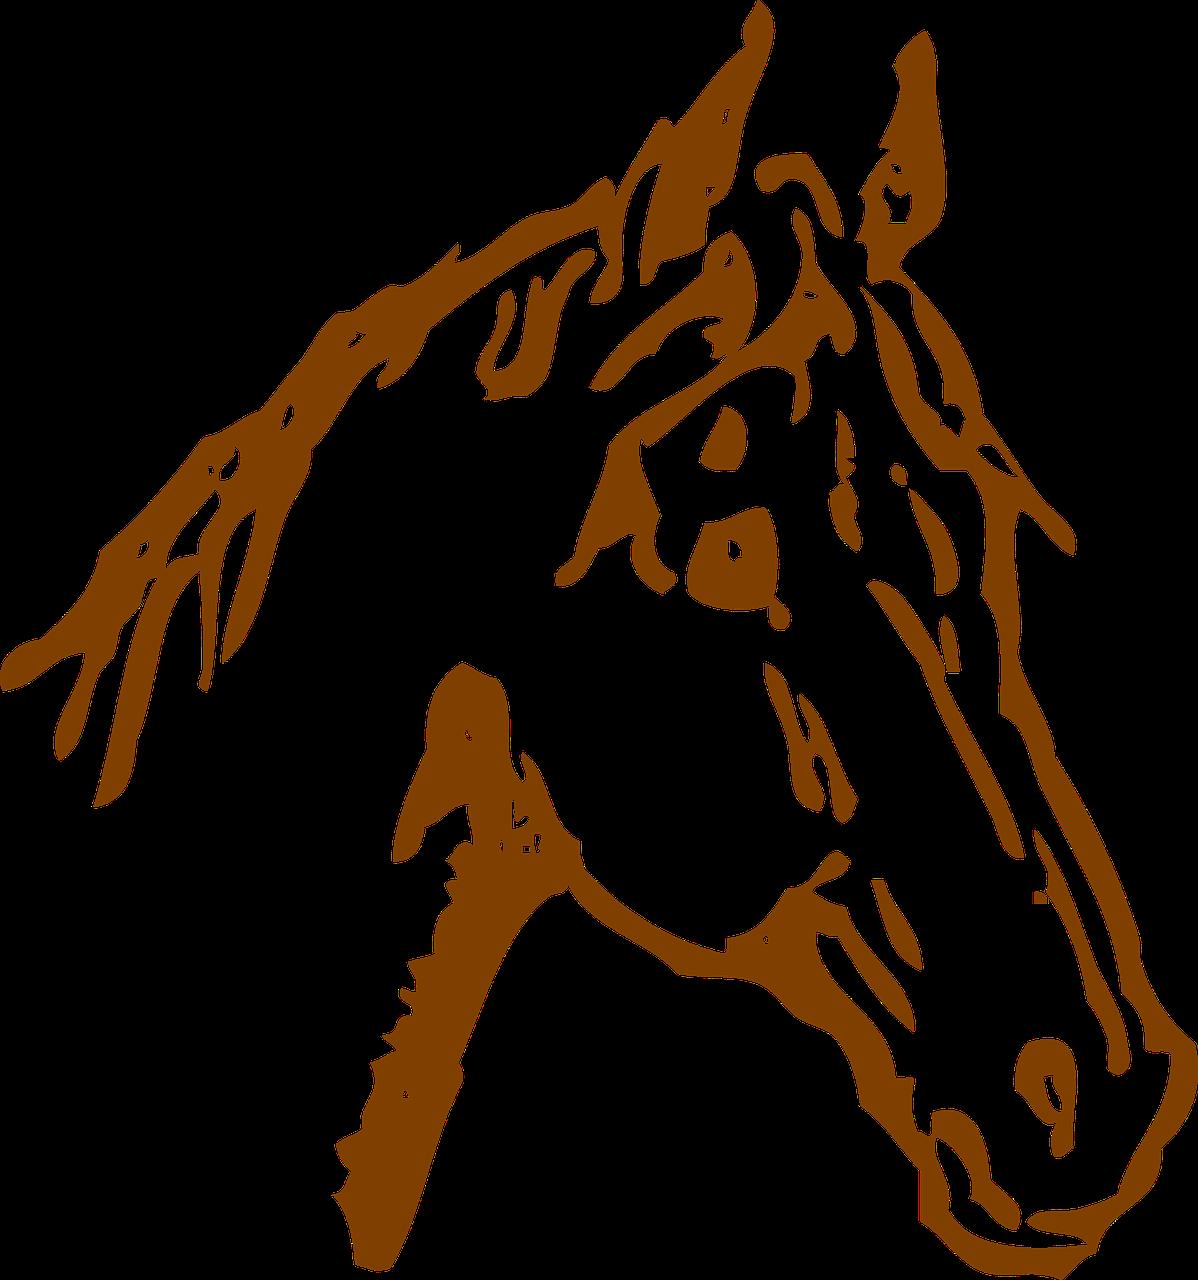 Quarter horse head silhouette